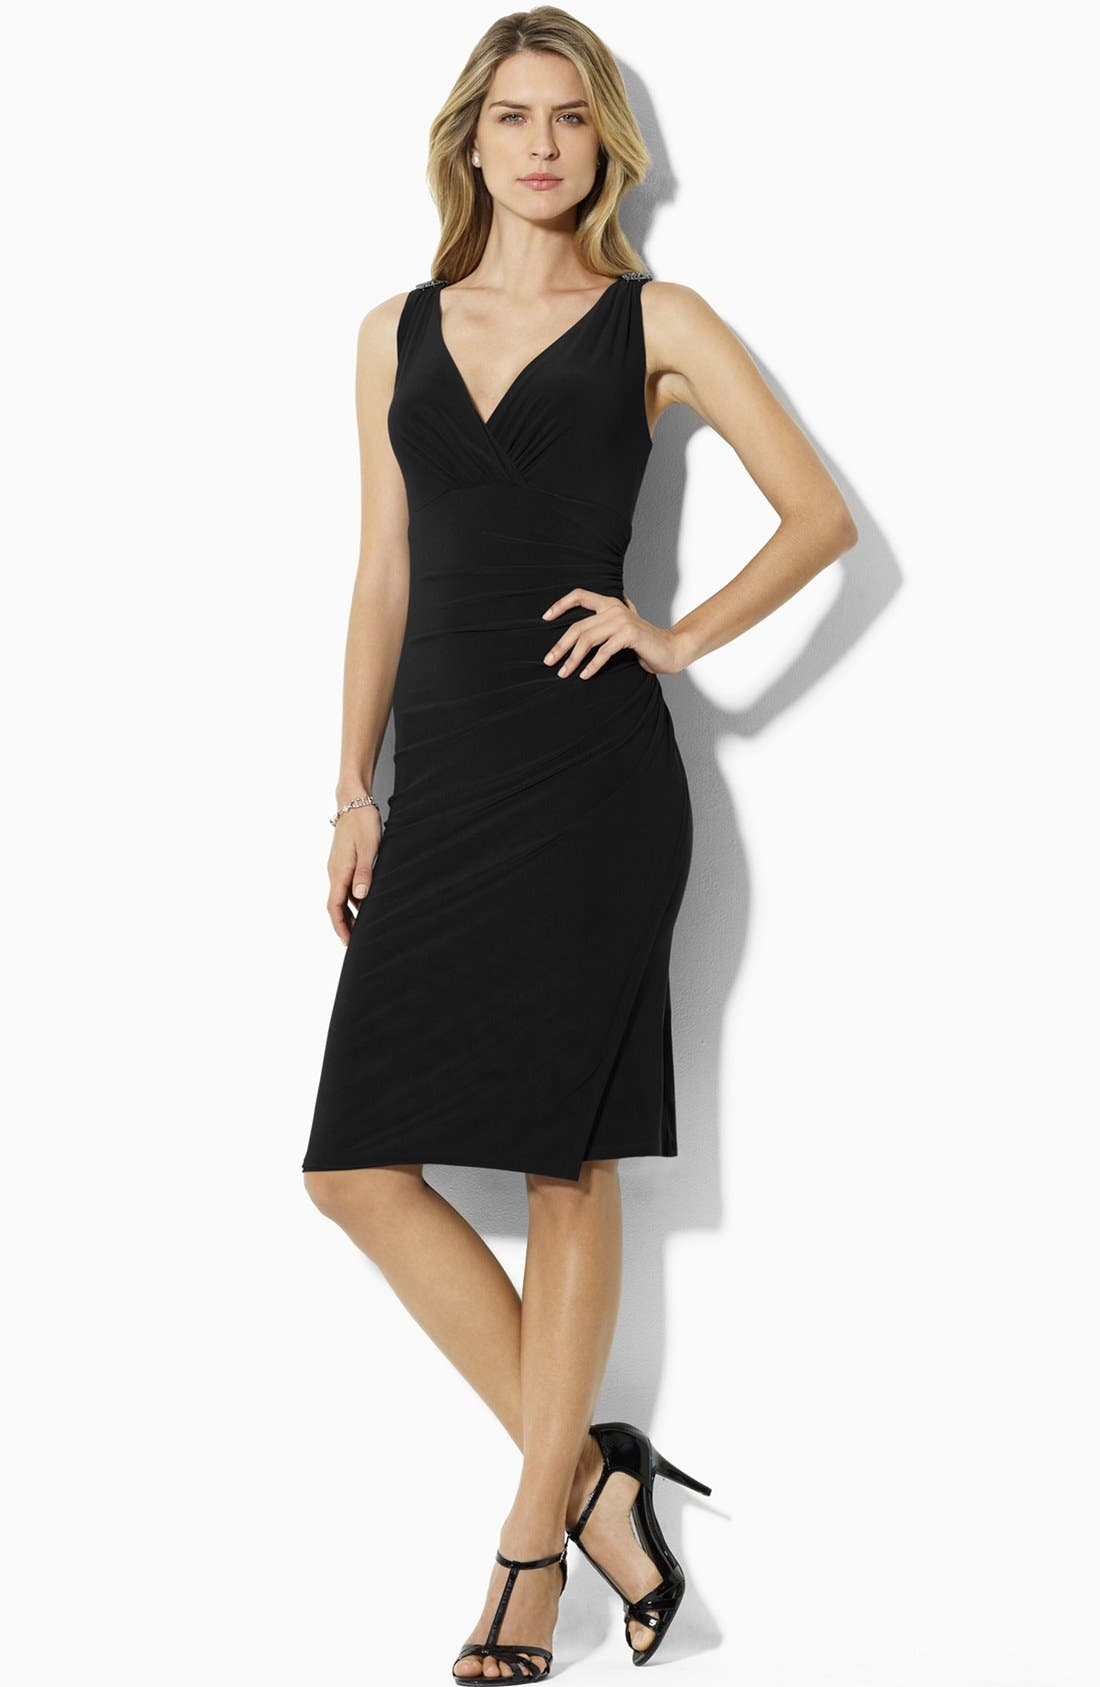 Alternate Image 1 Selected - Lauren Ralph Lauren Embellished Sleeveless Jersey Dress (Petite)